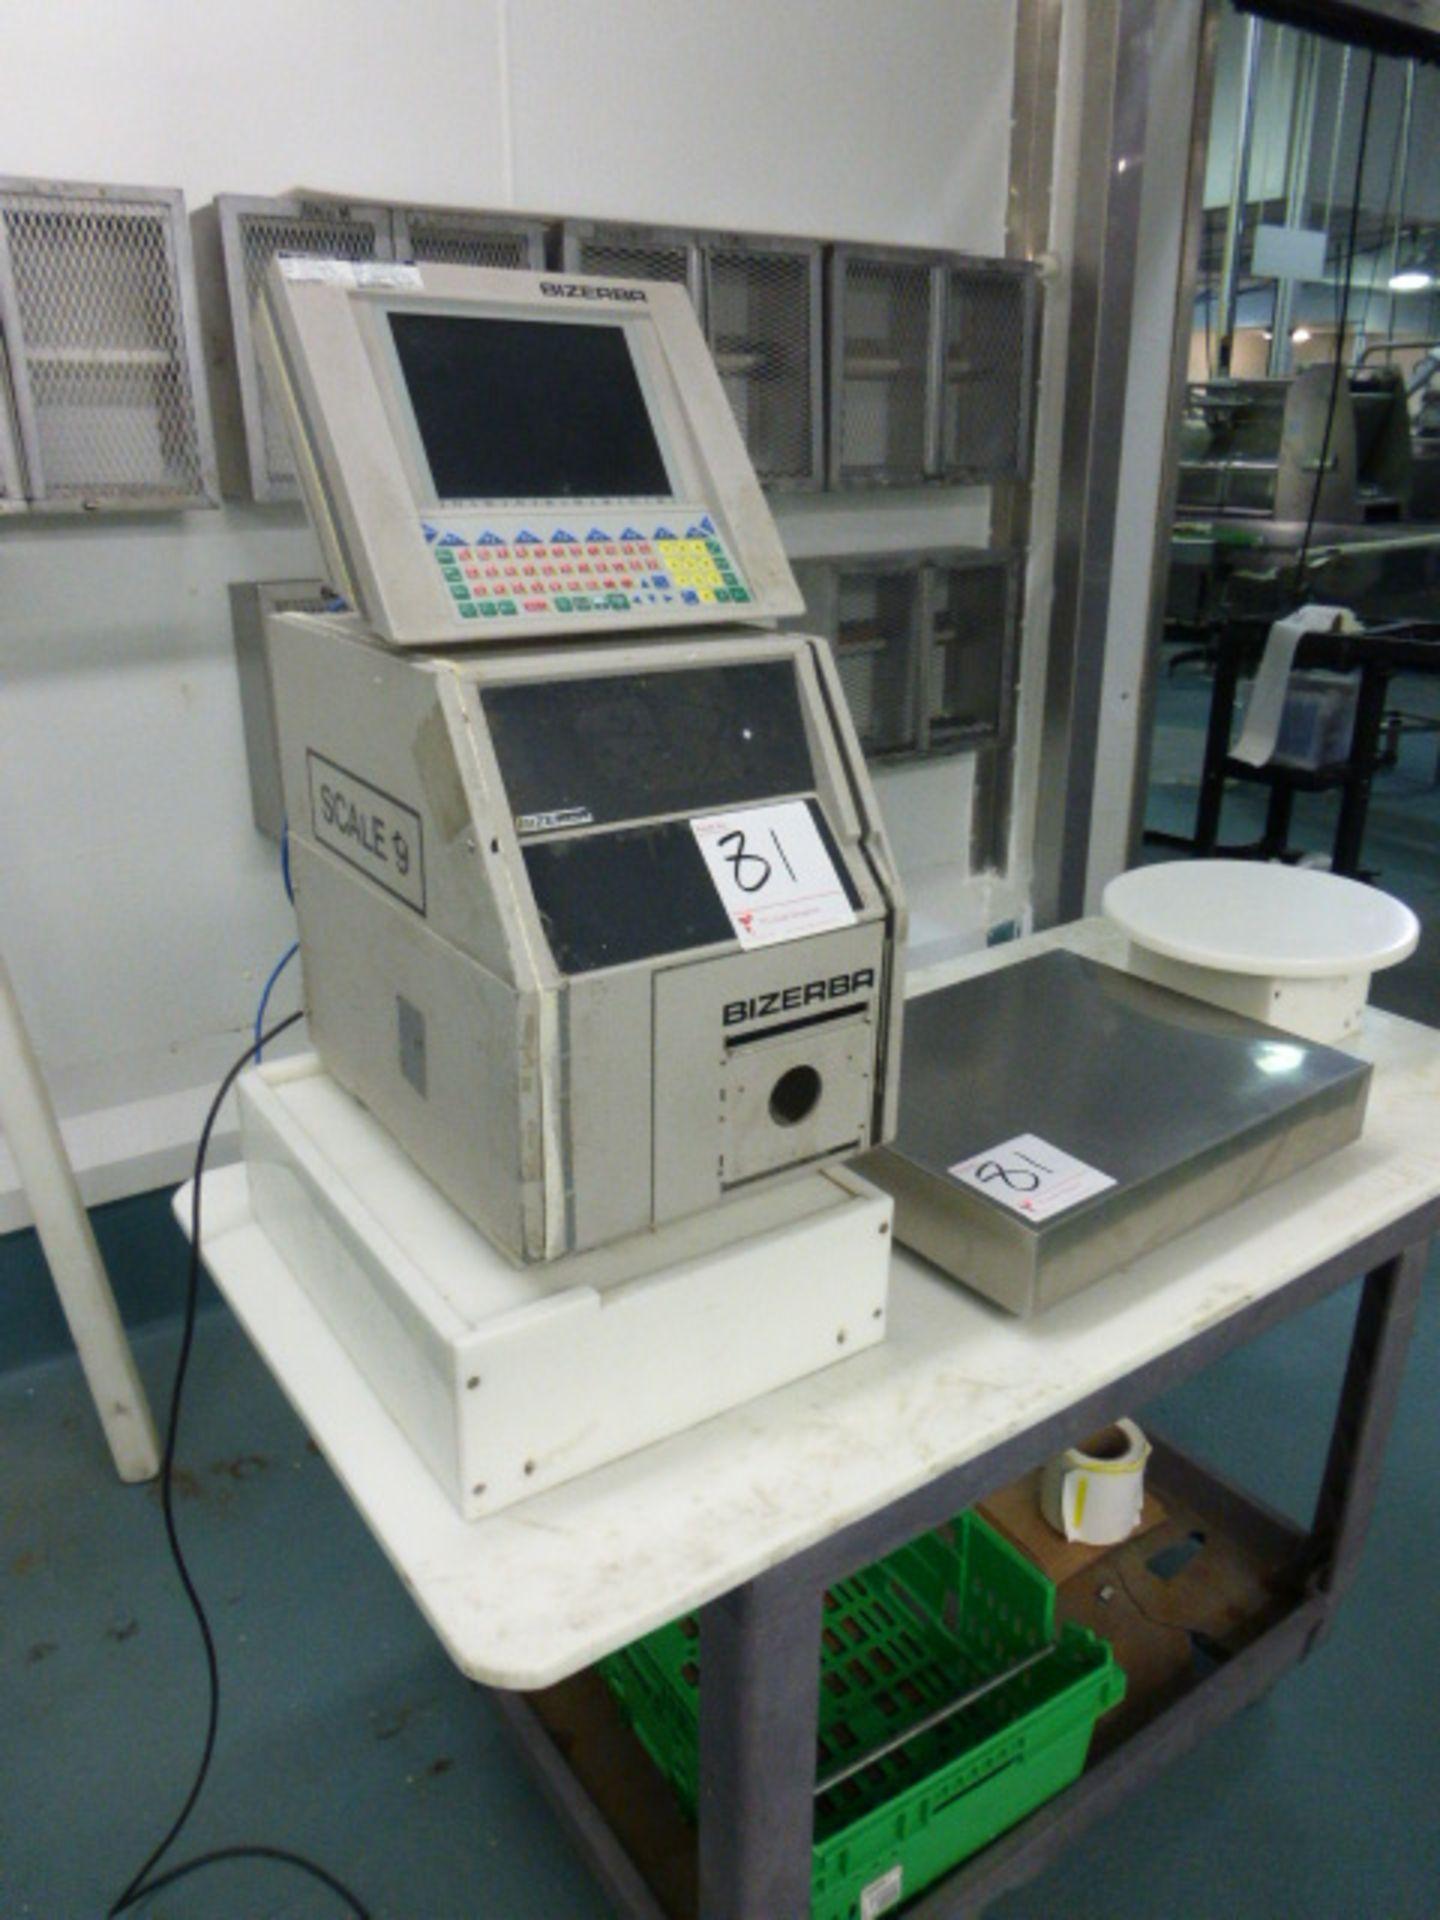 Bizerba check-weigher system w/ Bizerba GS label printer ser. no. 1945663 and Bizerba AB controller,